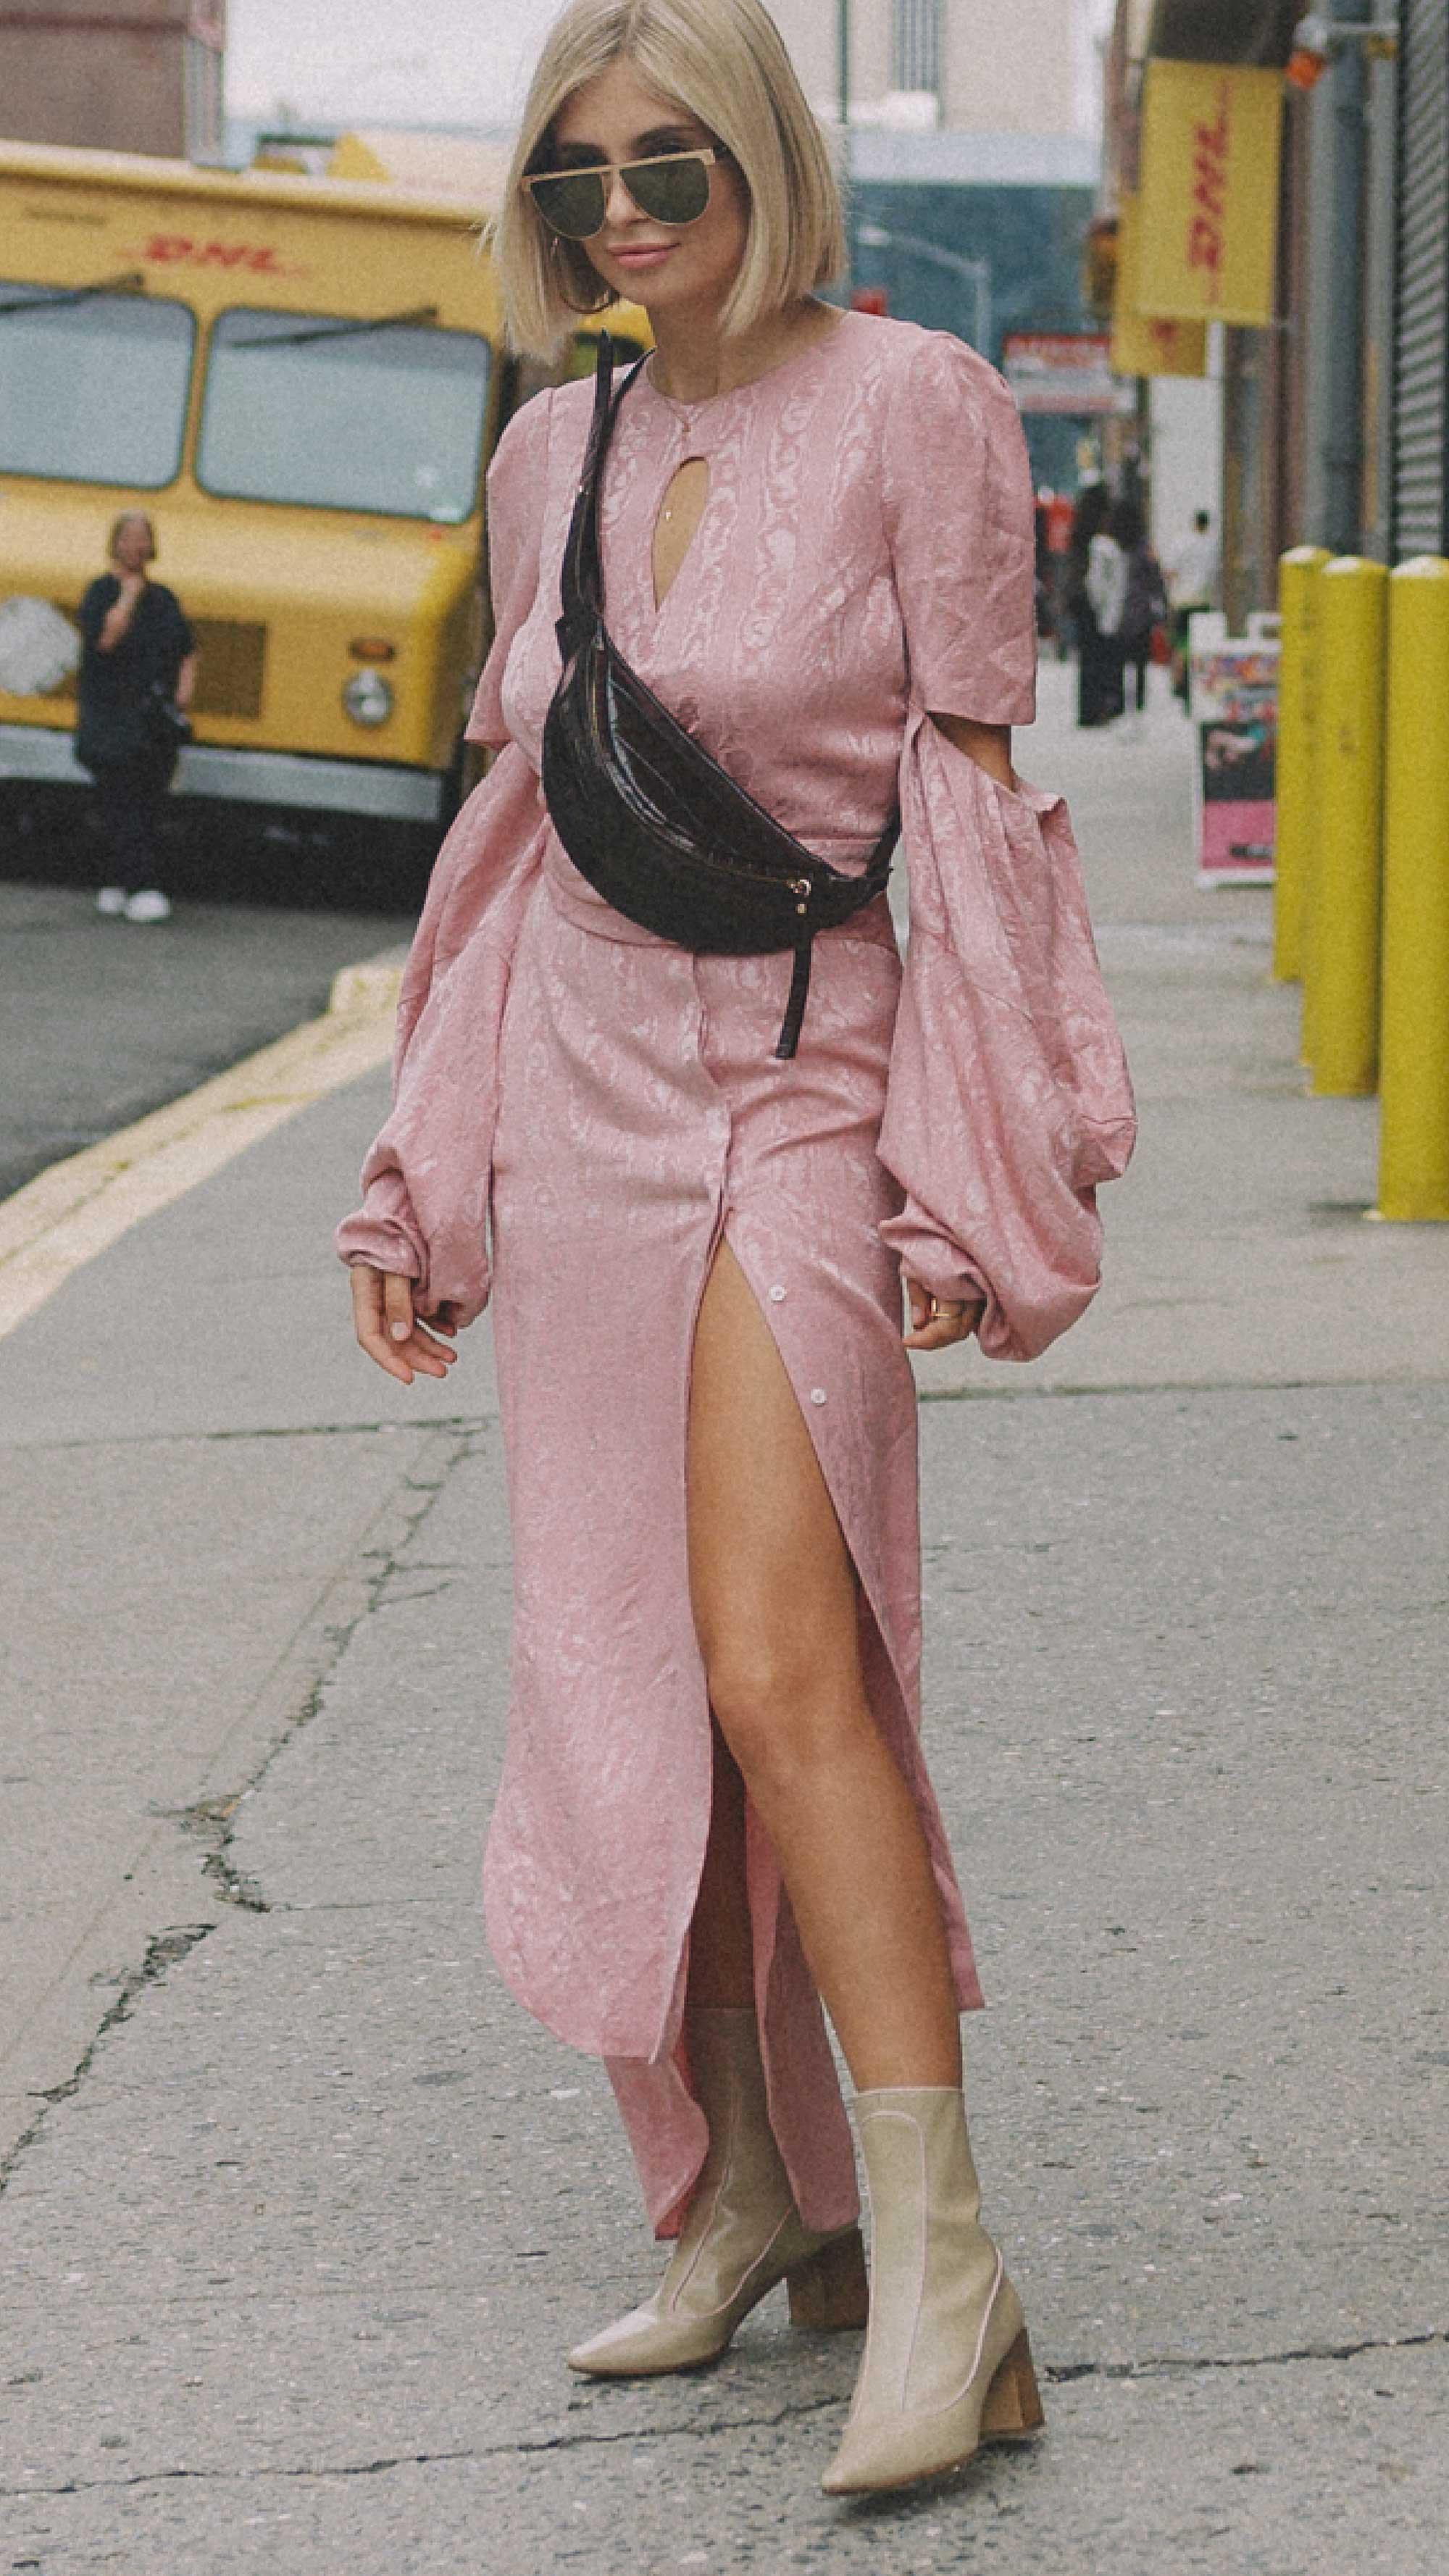 New-York-Fashion-Week-NYFW-SS18-street-style-day-two-SS18.jpg8.jpg